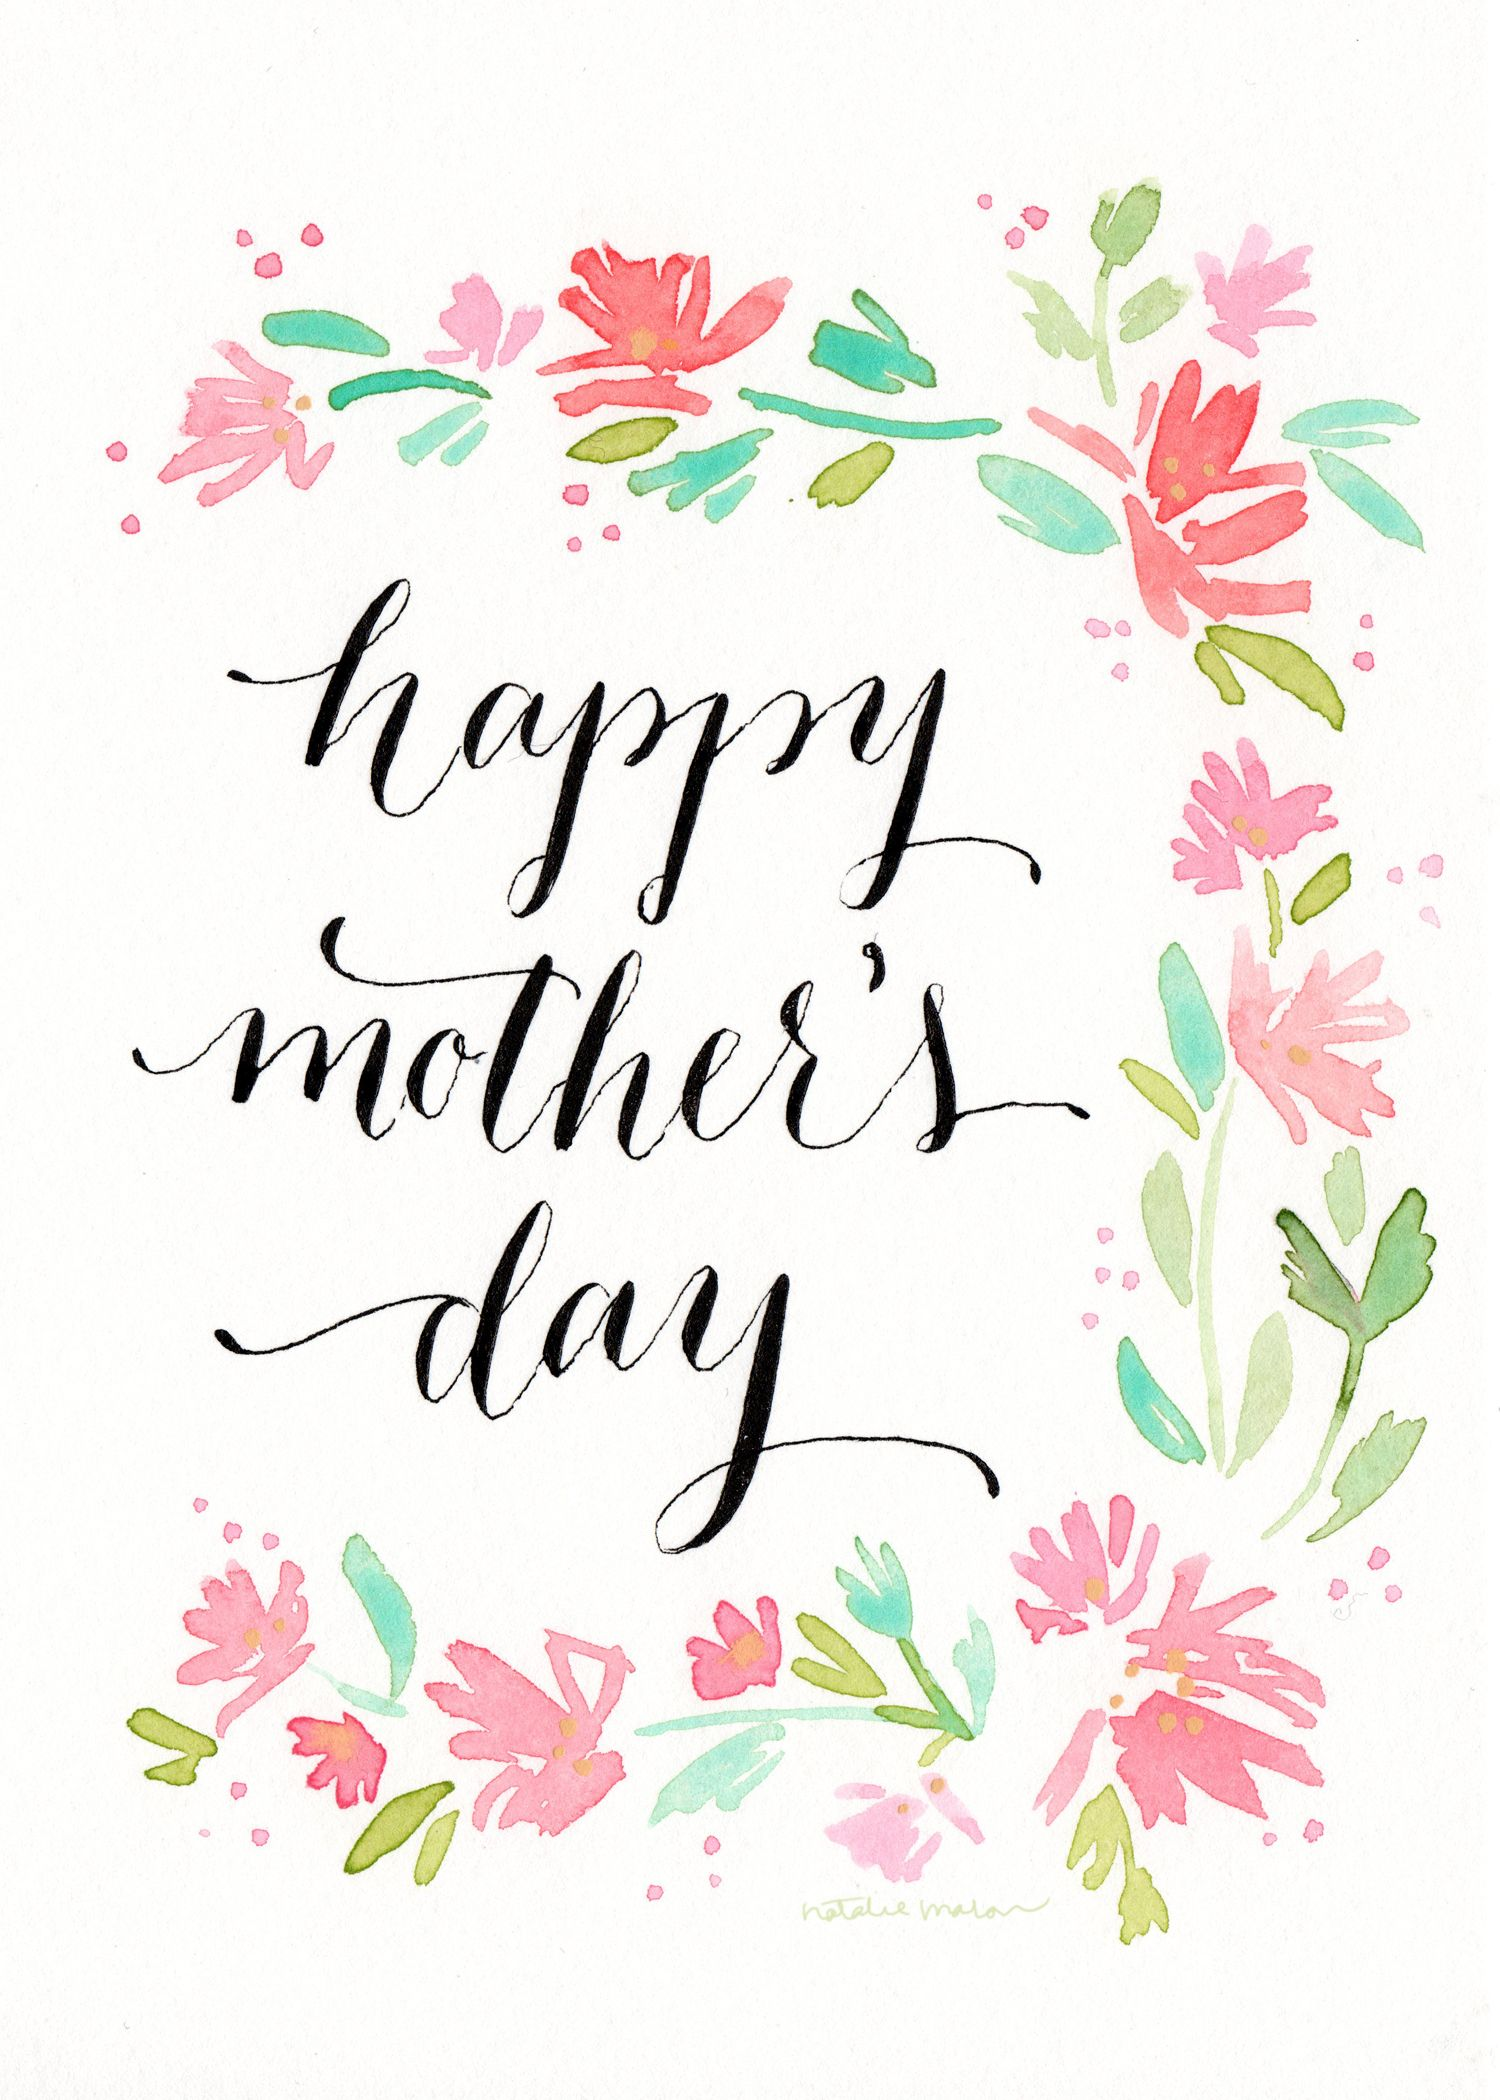 Nataliemalan Mothersday Free Printable 1 500 2 100